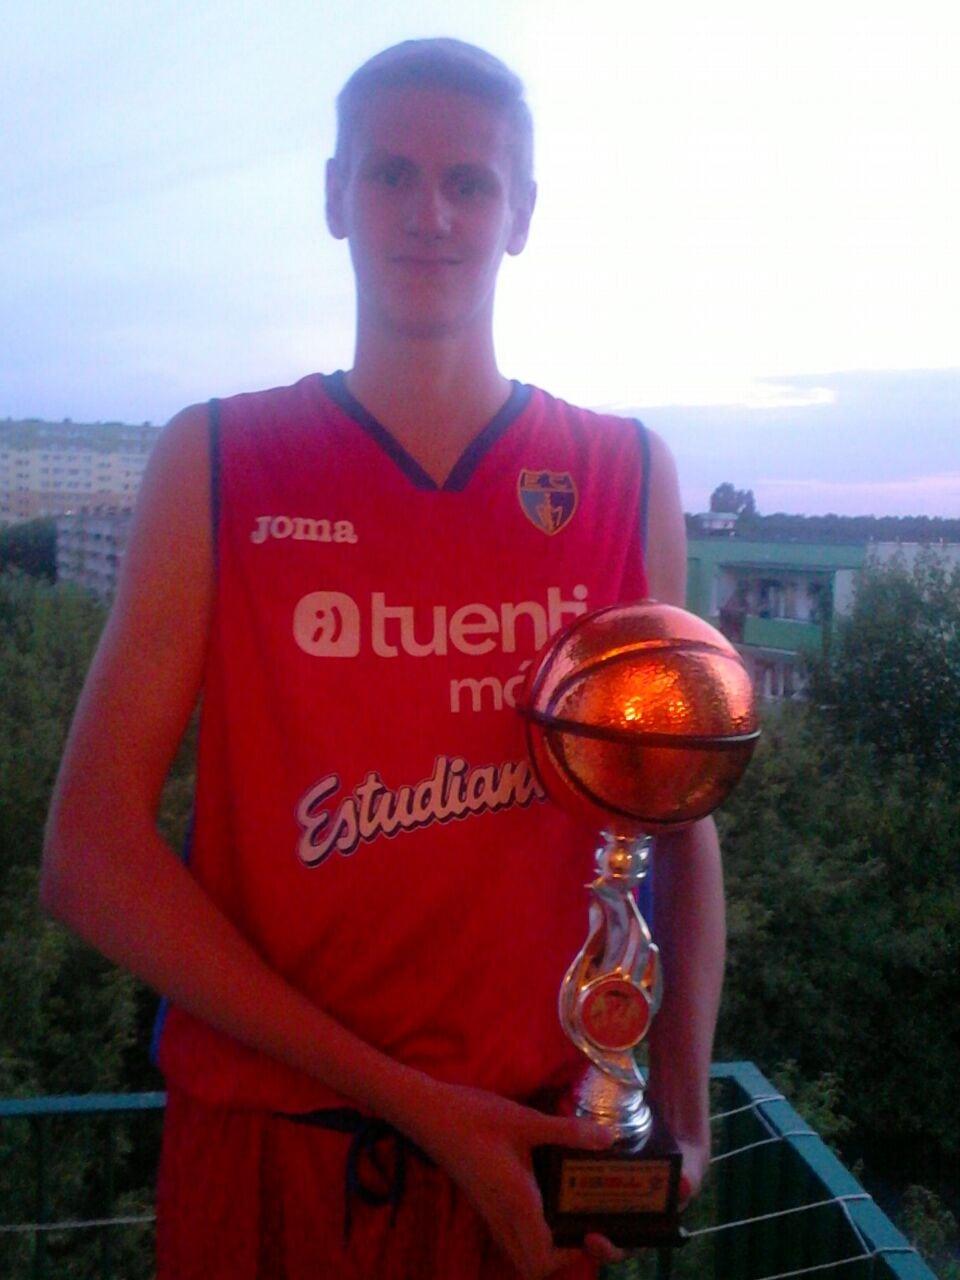 El cadete Bartek Pietras, MVP del torneo U16 Memorial Tiziano Cotti con Polonia